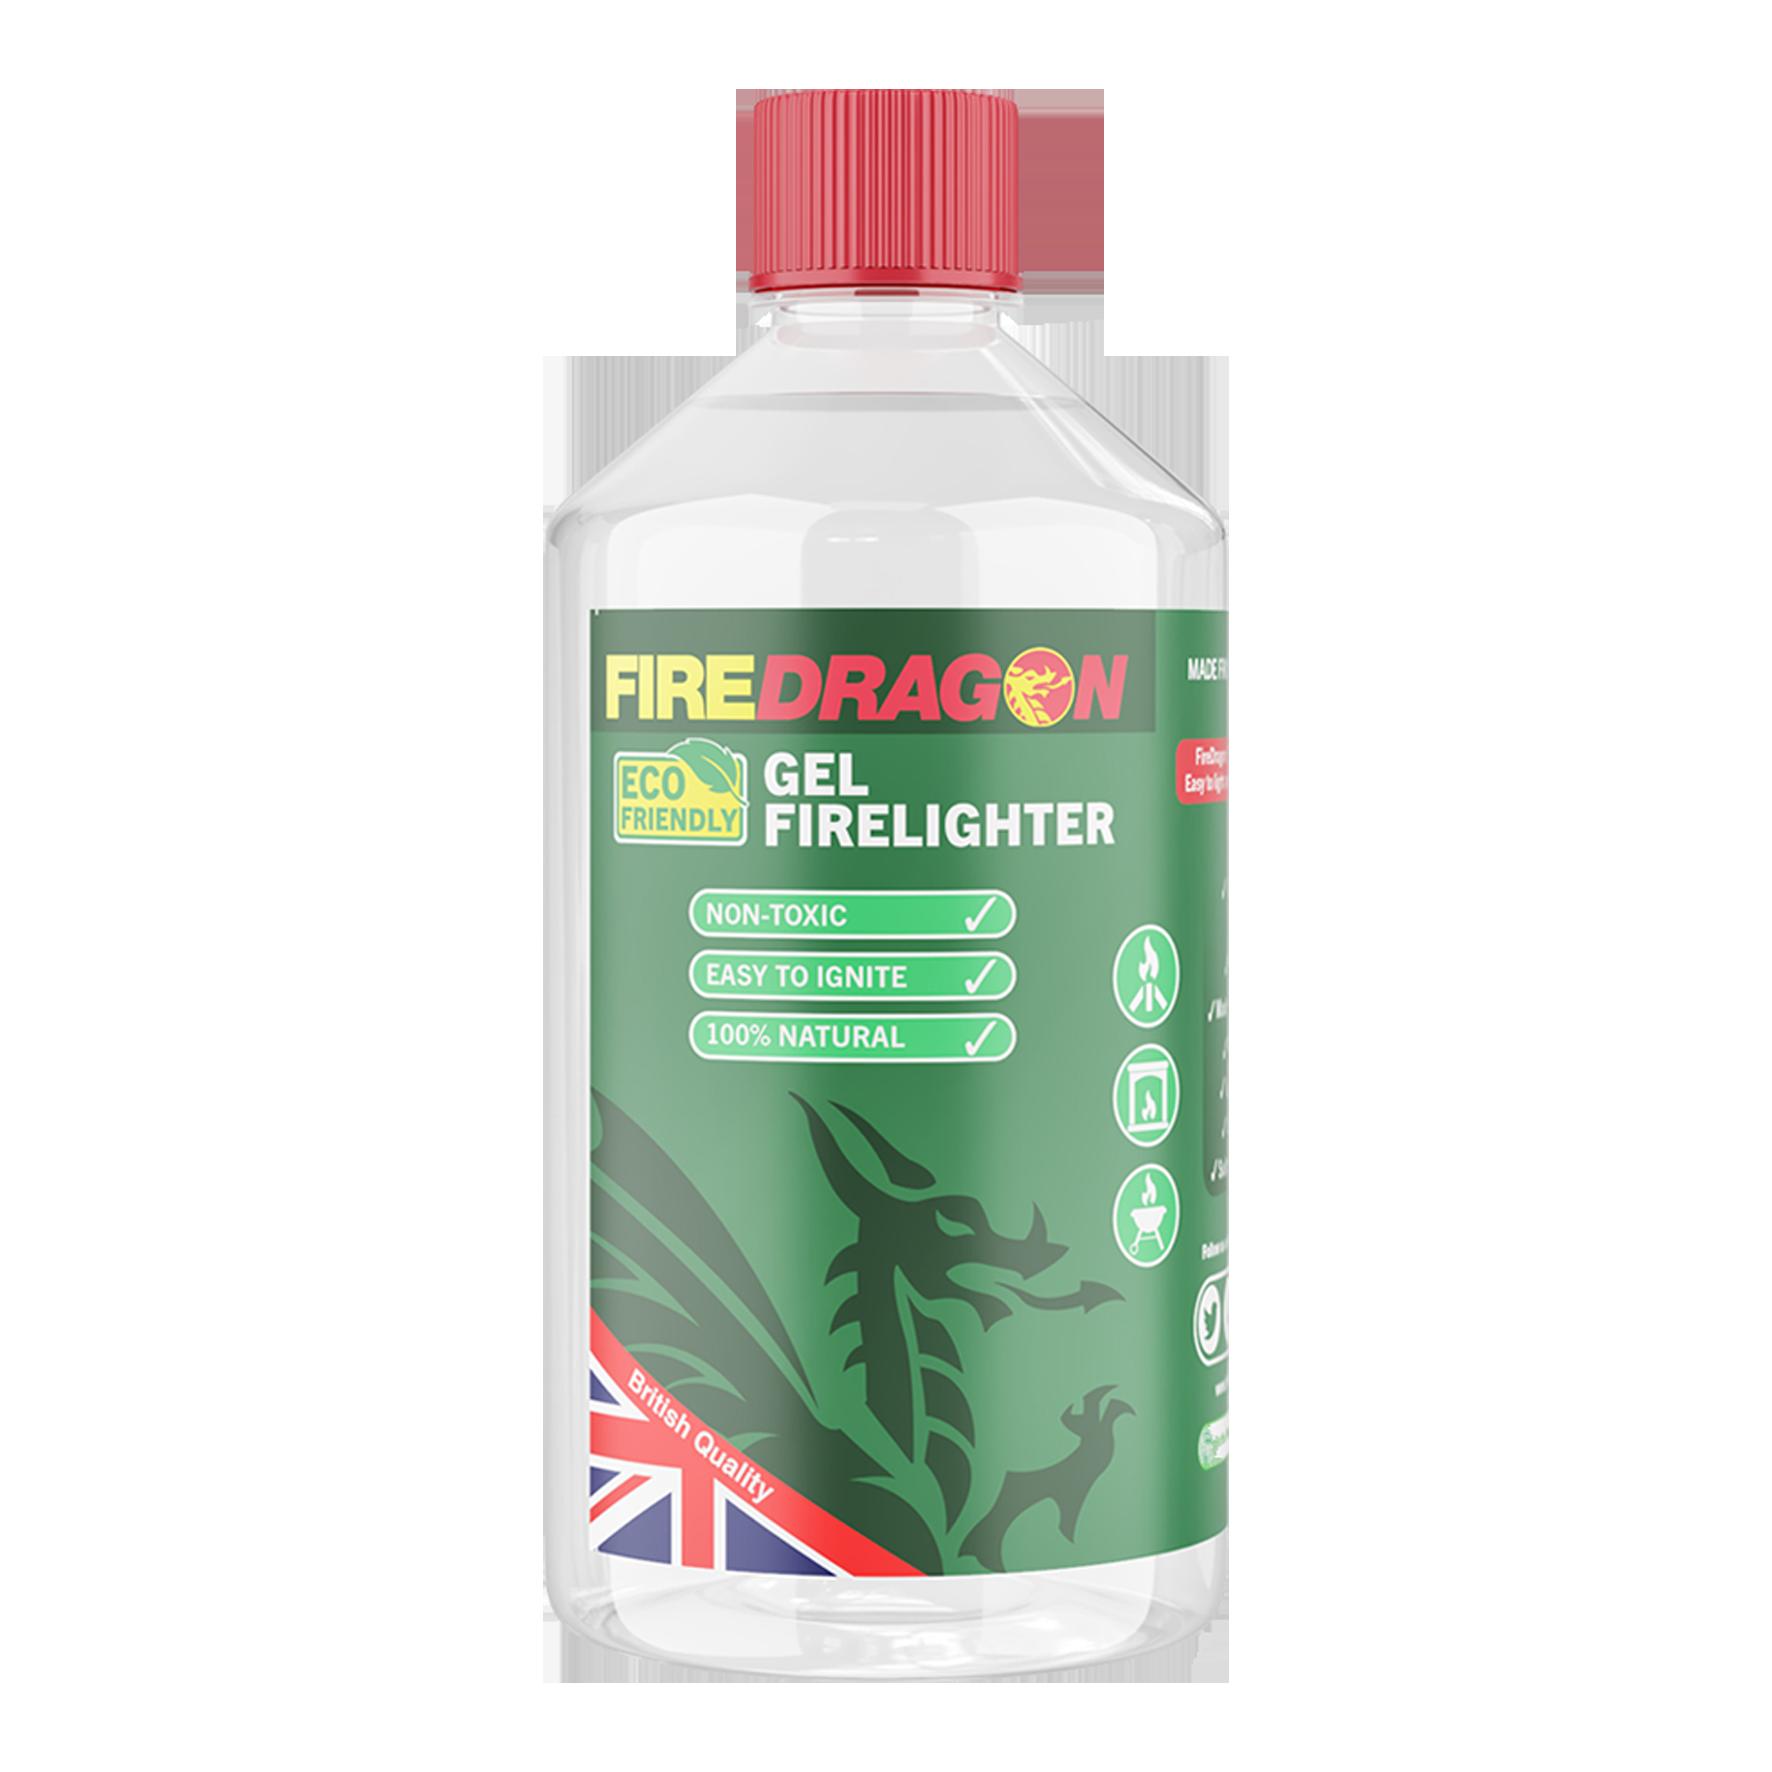 FireDragon 1 Litre Gel Eco-friendly firelighter